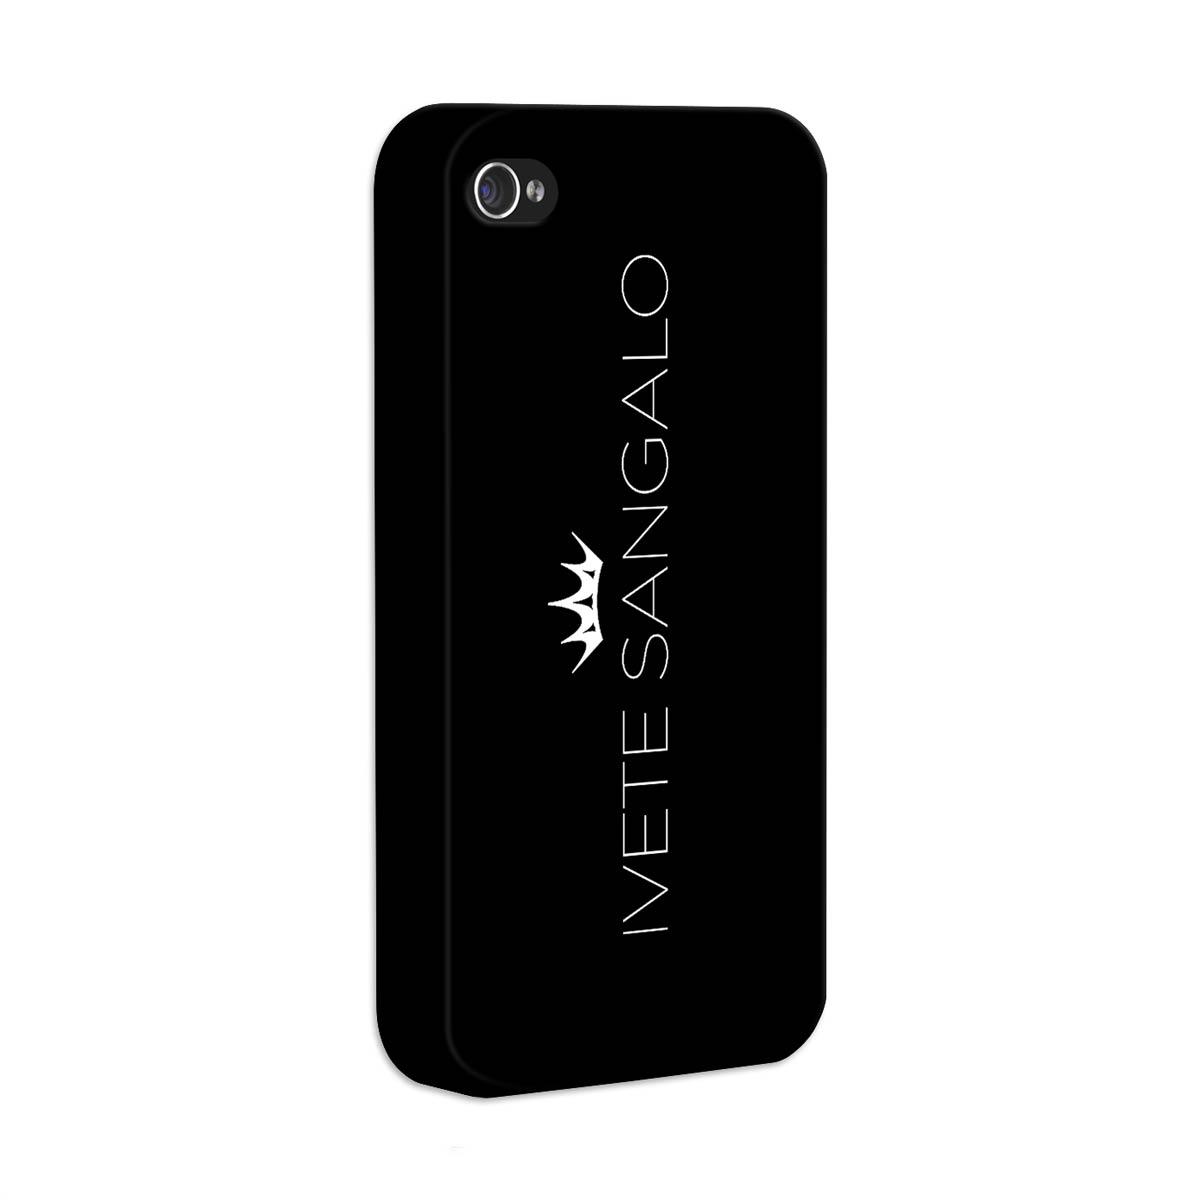 Capa de iPhone 4/4S Ivete Sangalo Logo